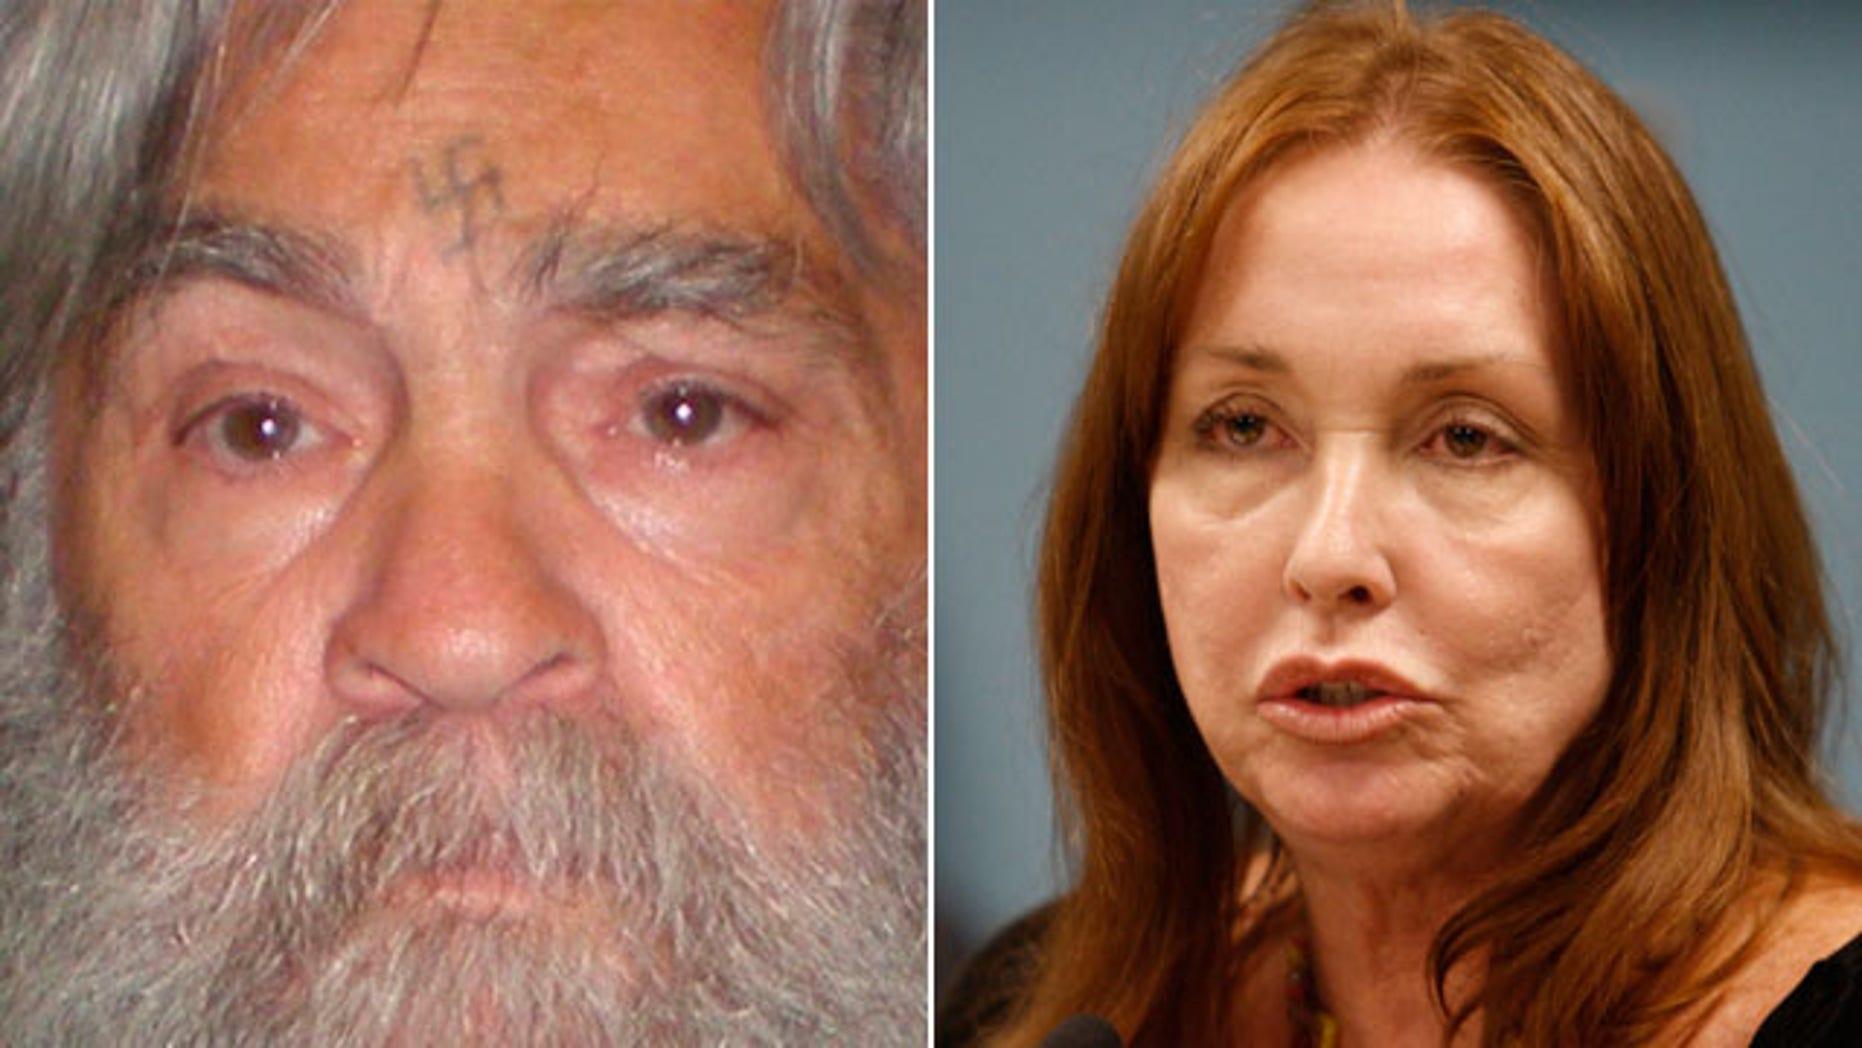 FILE: Debra Tate, sister of Sharon Tate, speaks at a parole hearing for Manson follower Susan Atkins.